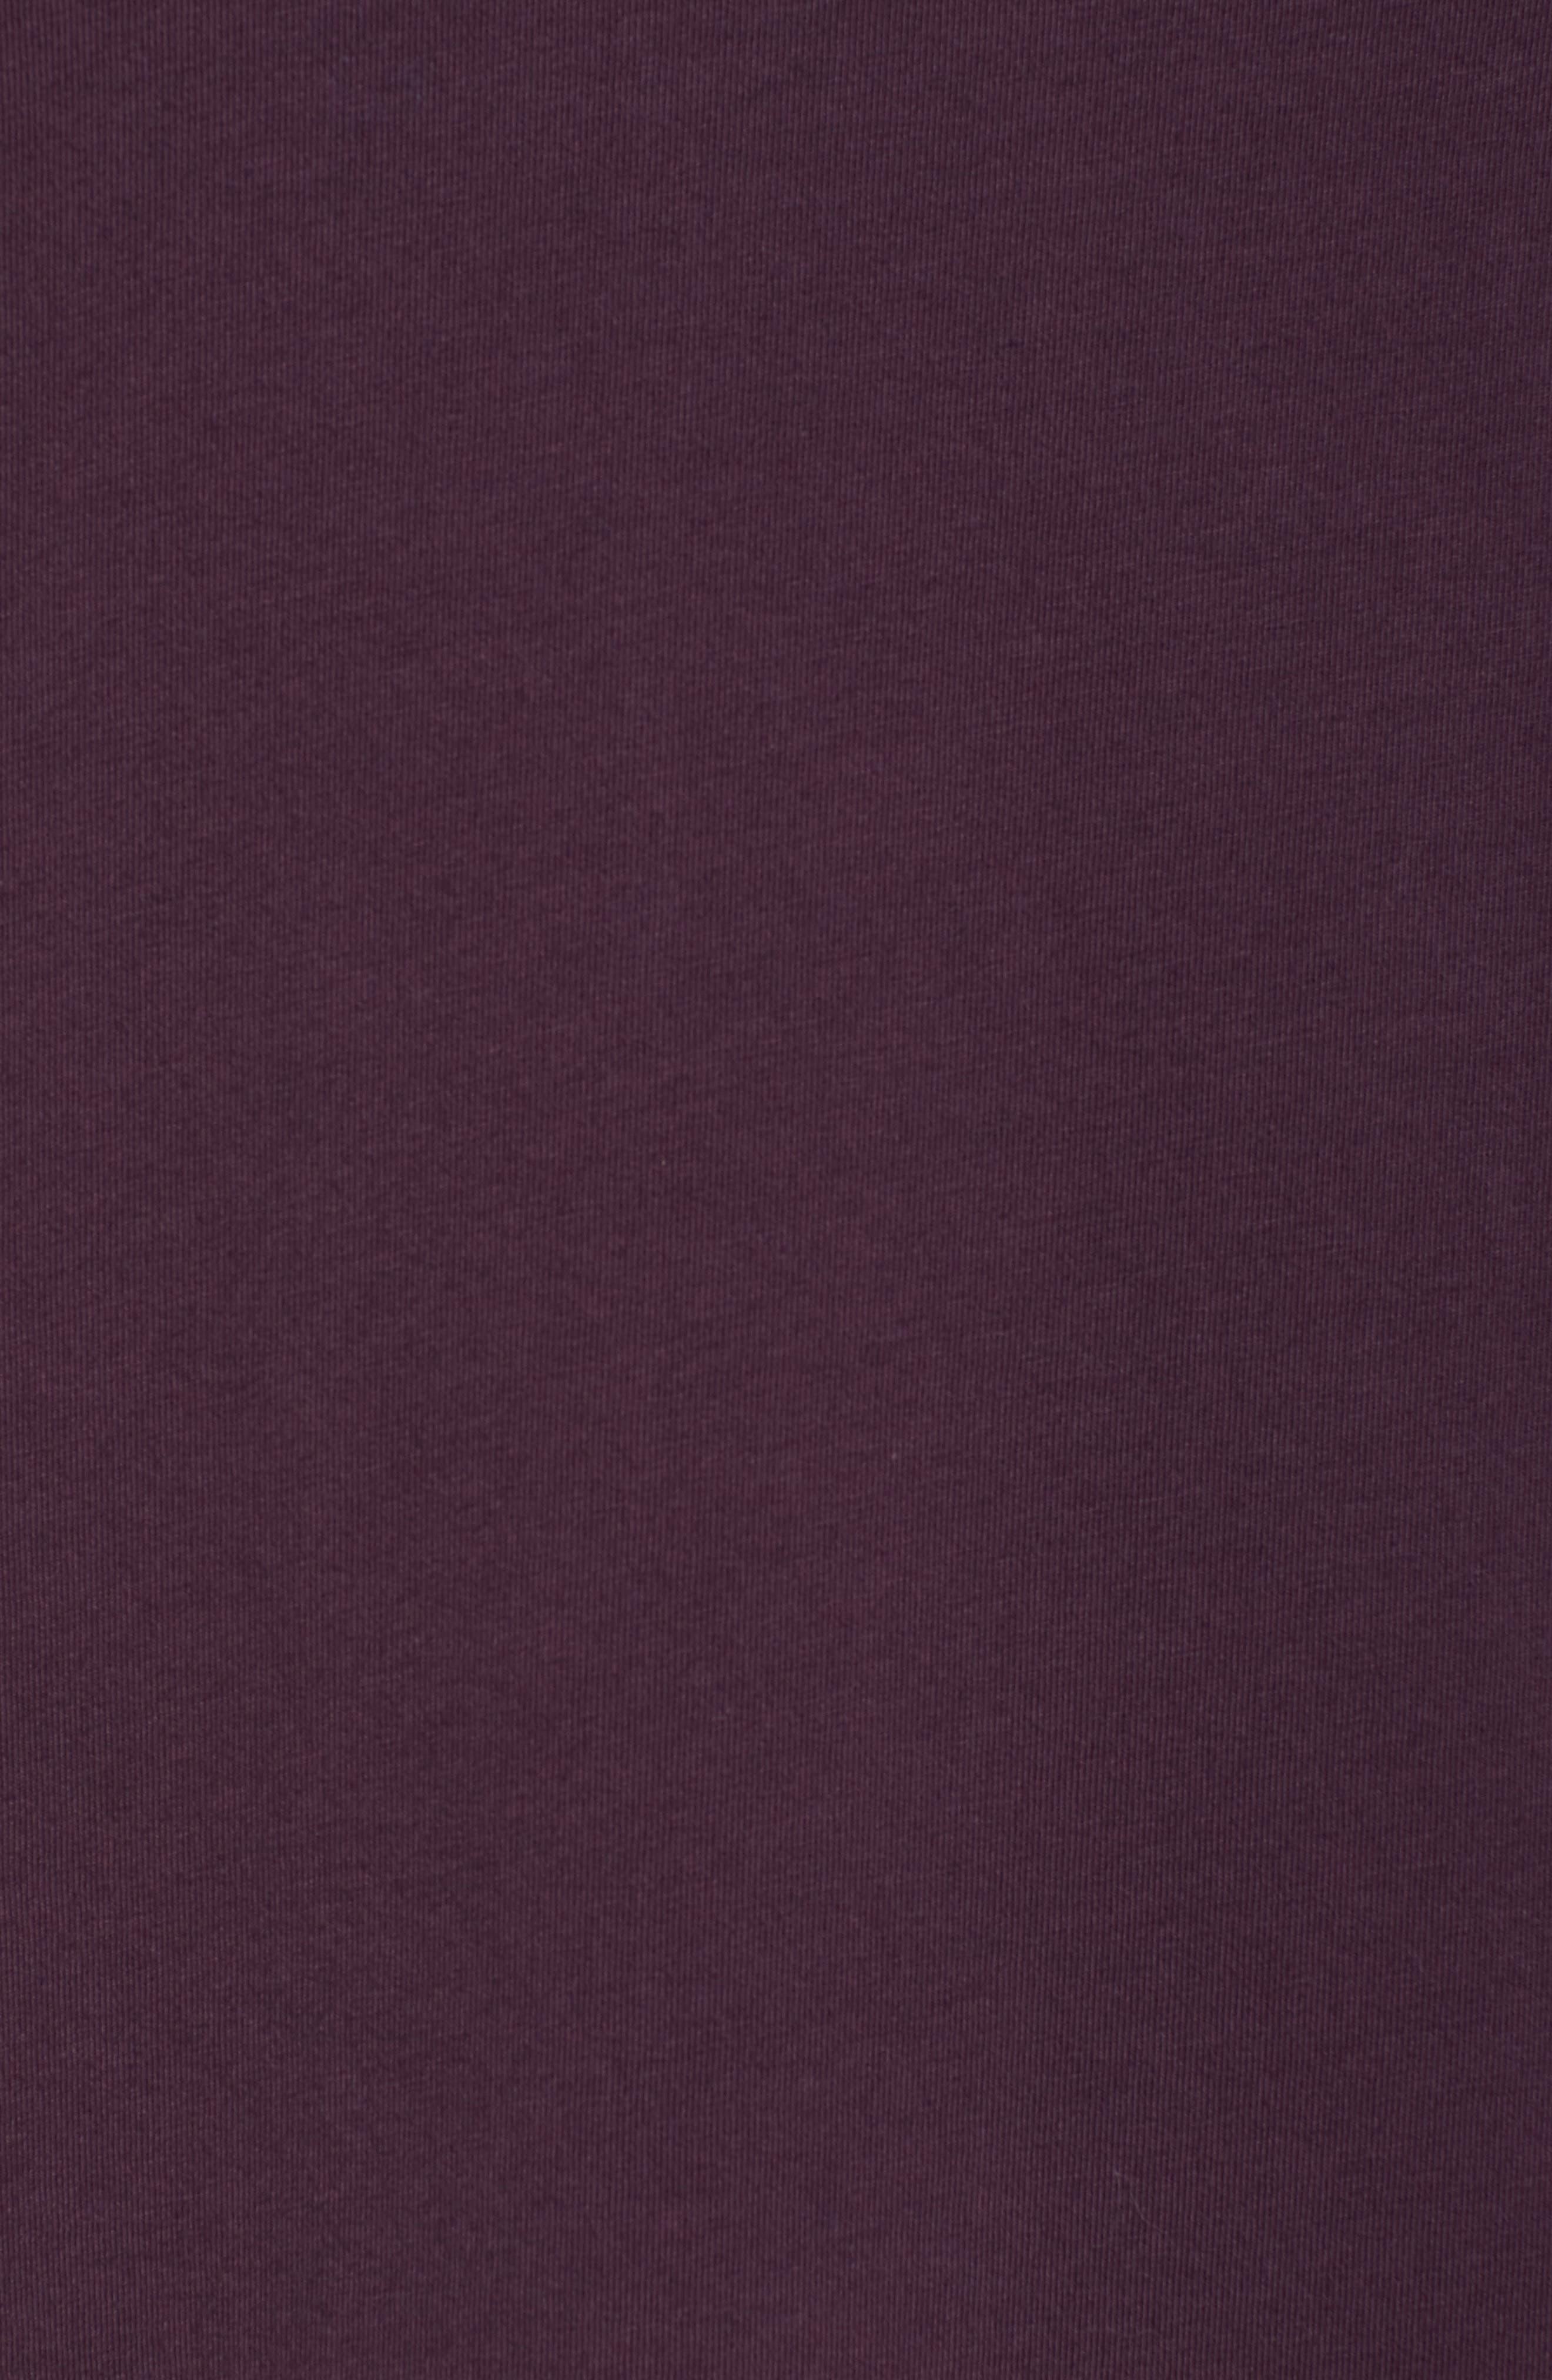 Ballet Neck Long Sleeve Tee,                             Alternate thumbnail 5, color,                             Purple Plum